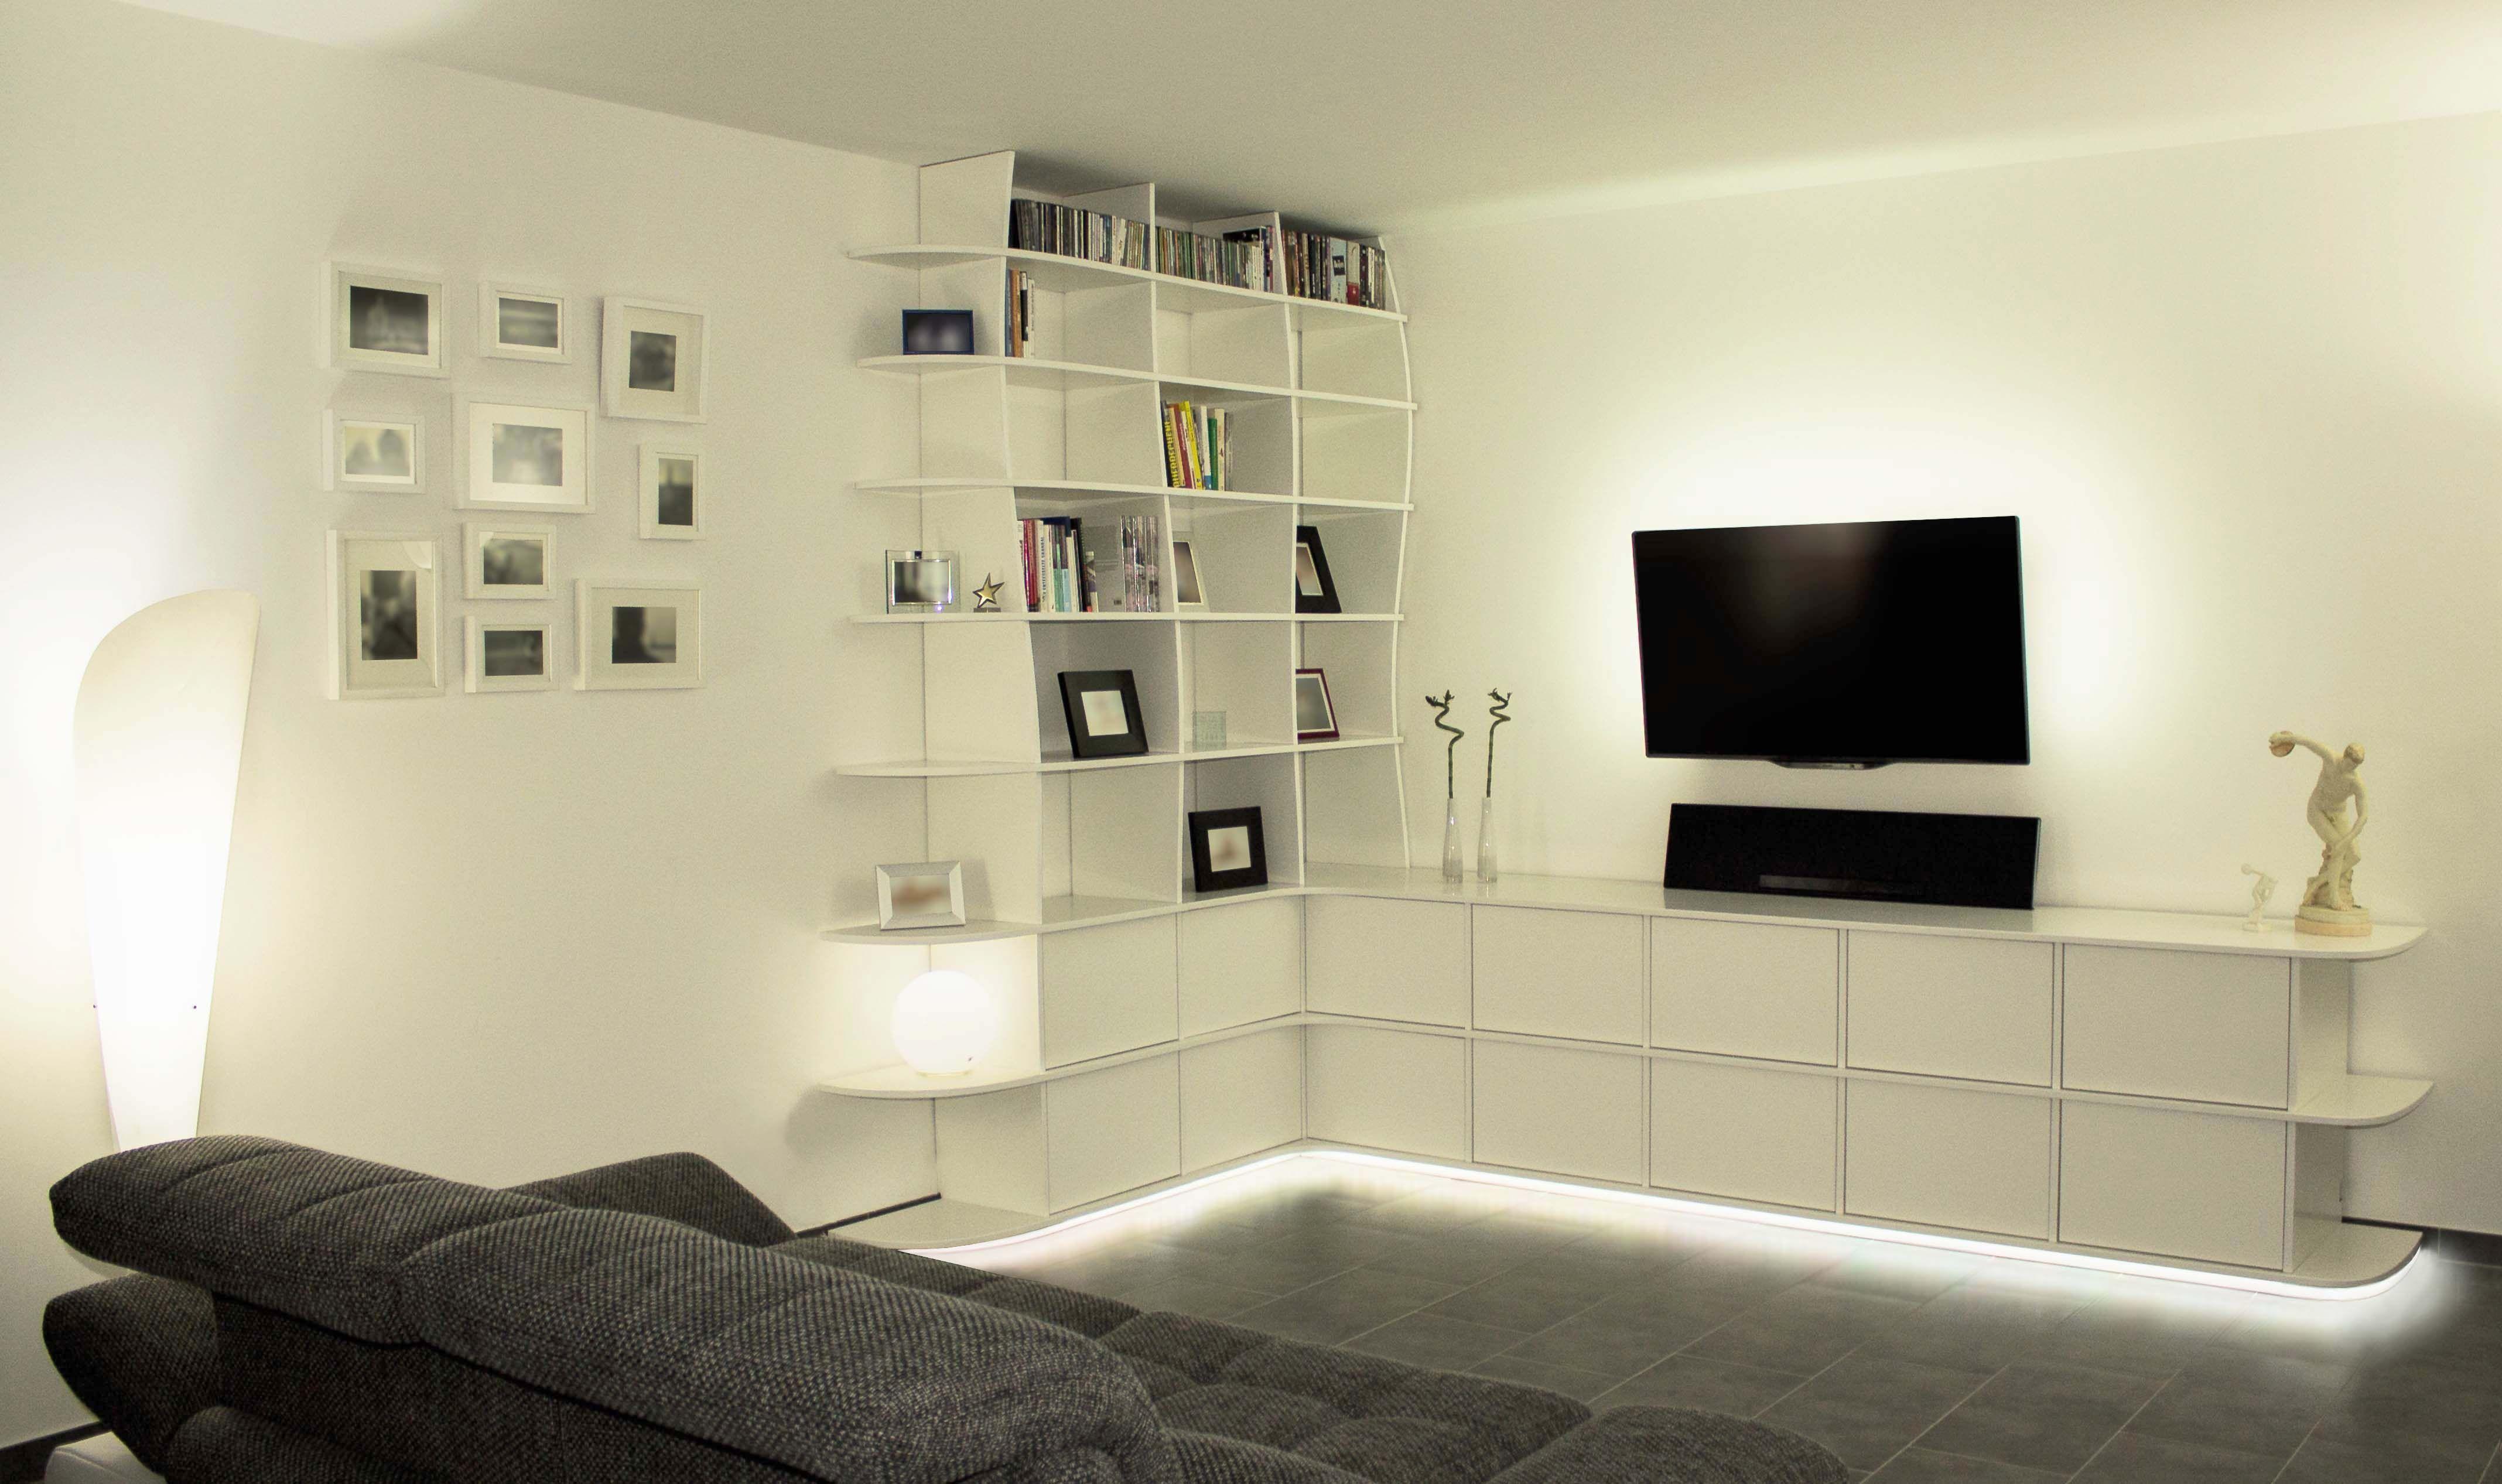 Tuffing loft bed ideas  Wohnwand  TV Rack  Okinlab  Bunk Bed Ideas  Pinterest  Tv rack